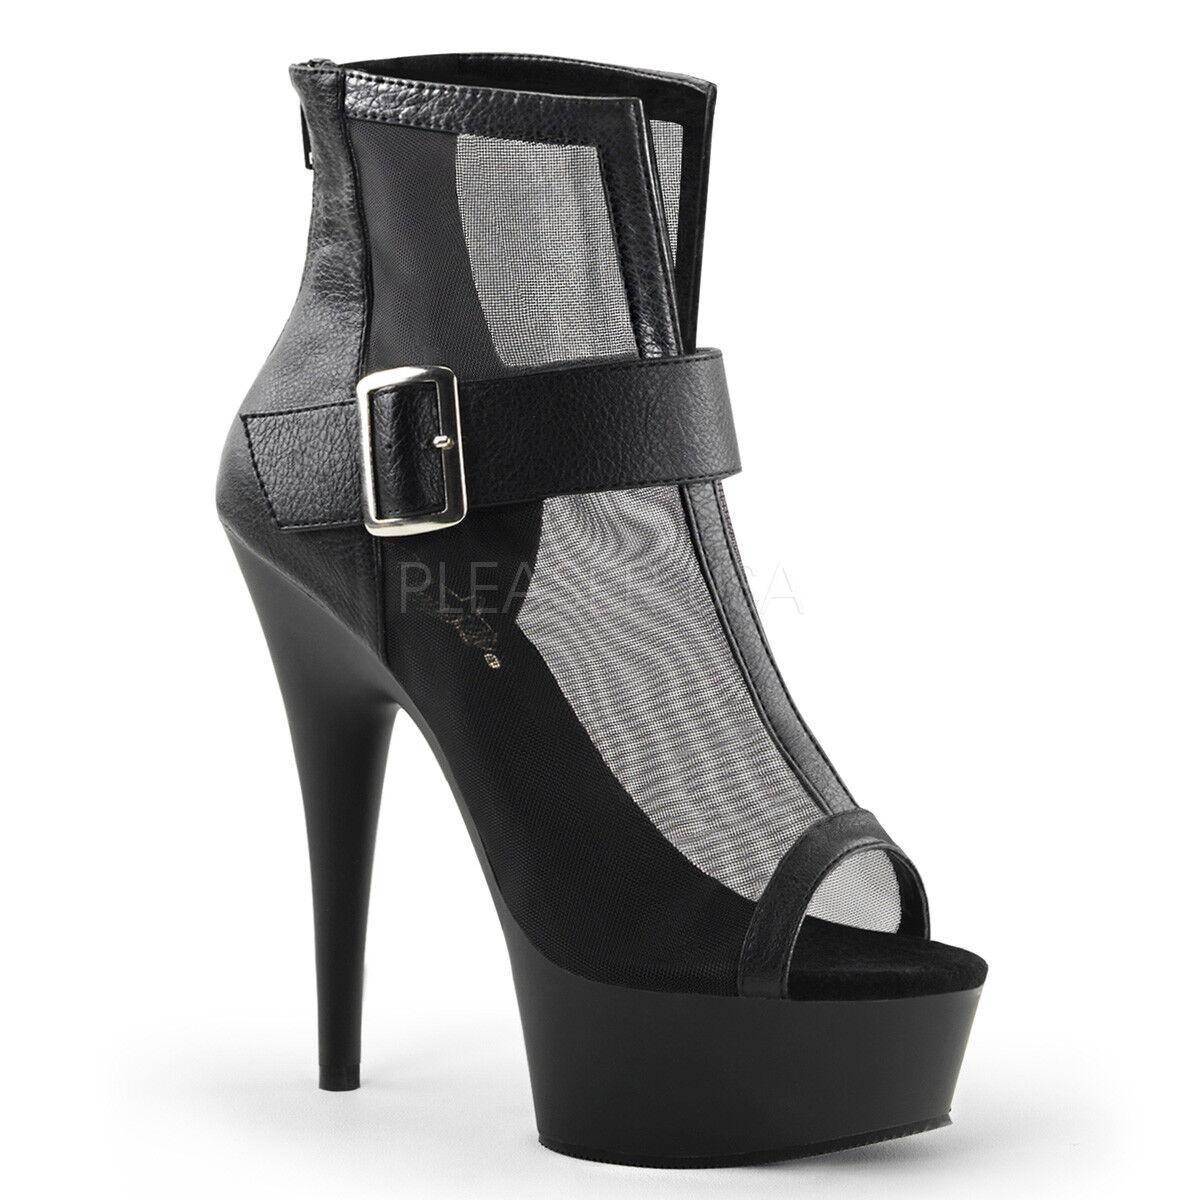 PLEASER - - - Delight-600-23 Sexy Platform Open Toe Mesh Ankle Stiefelie Stiefel 7bc245